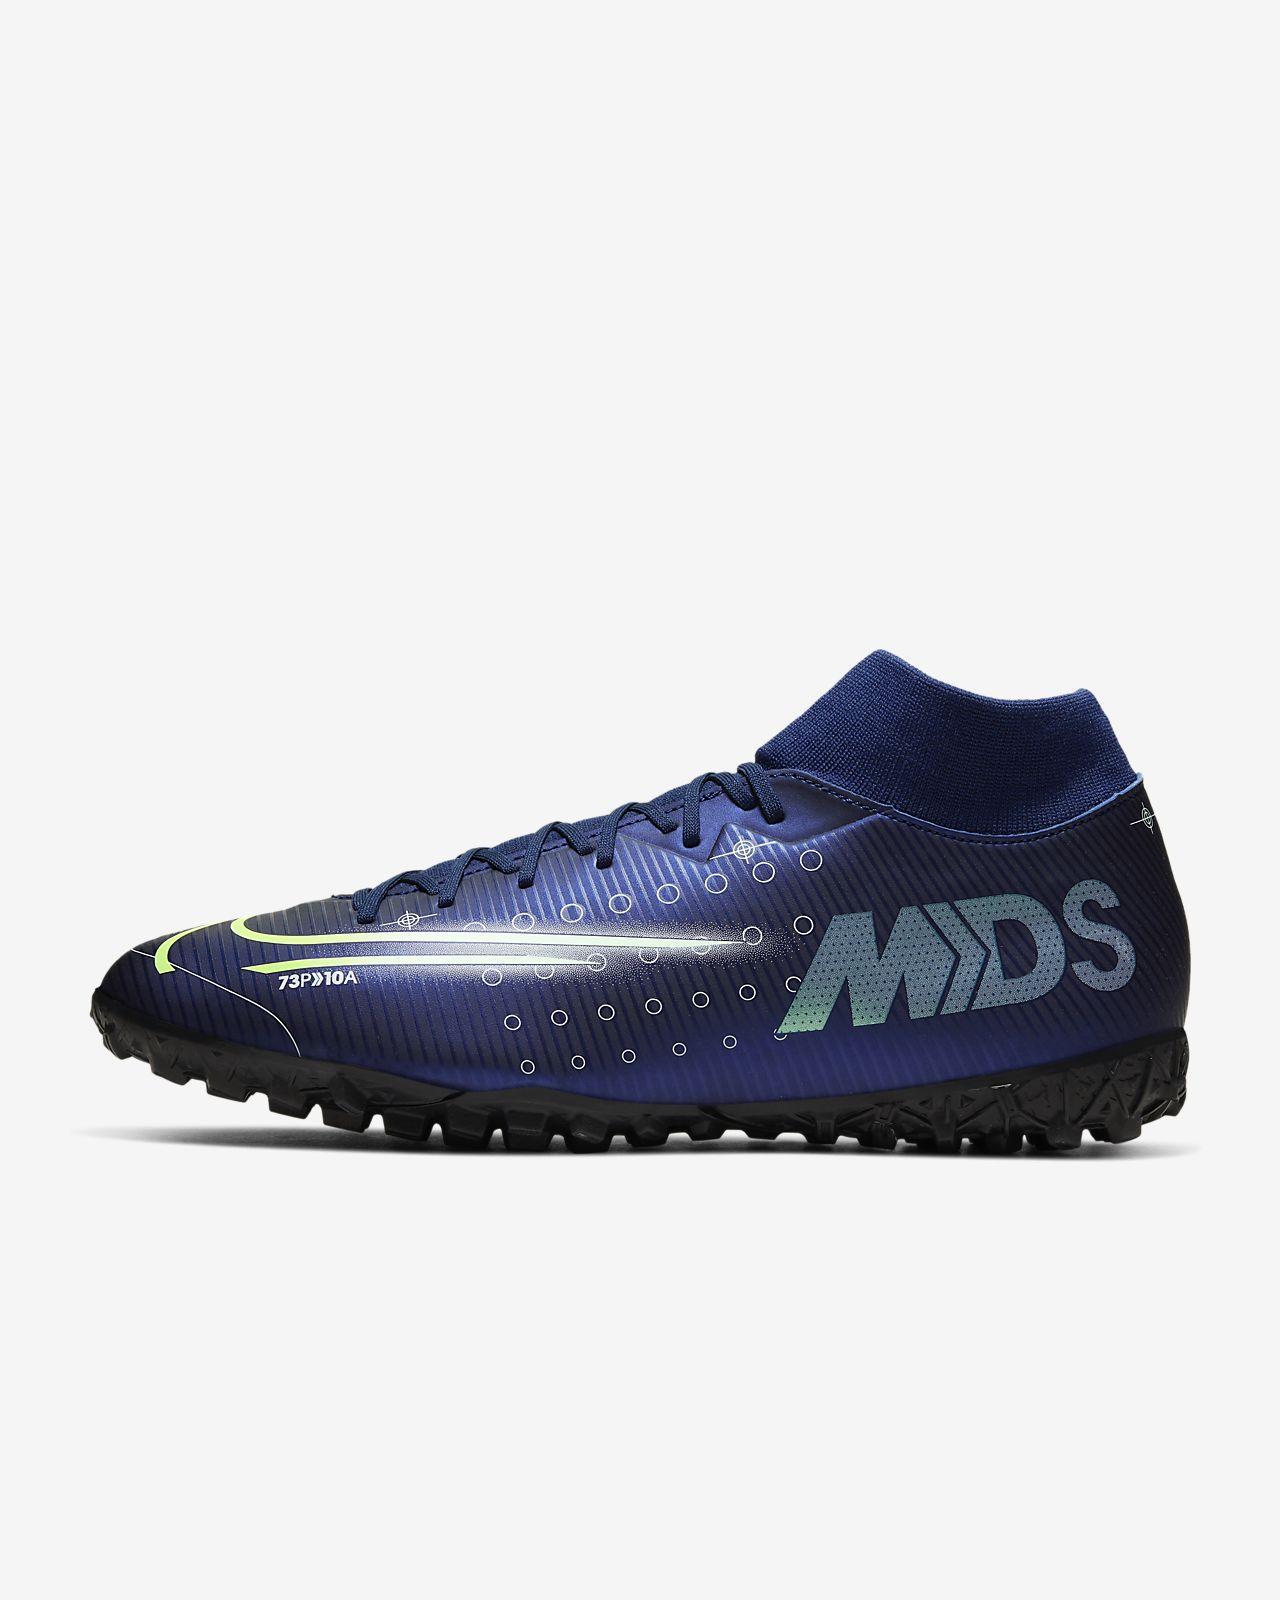 Nike Mercurial Superfly 7 Academy MDS TF-fodboldsko til grus